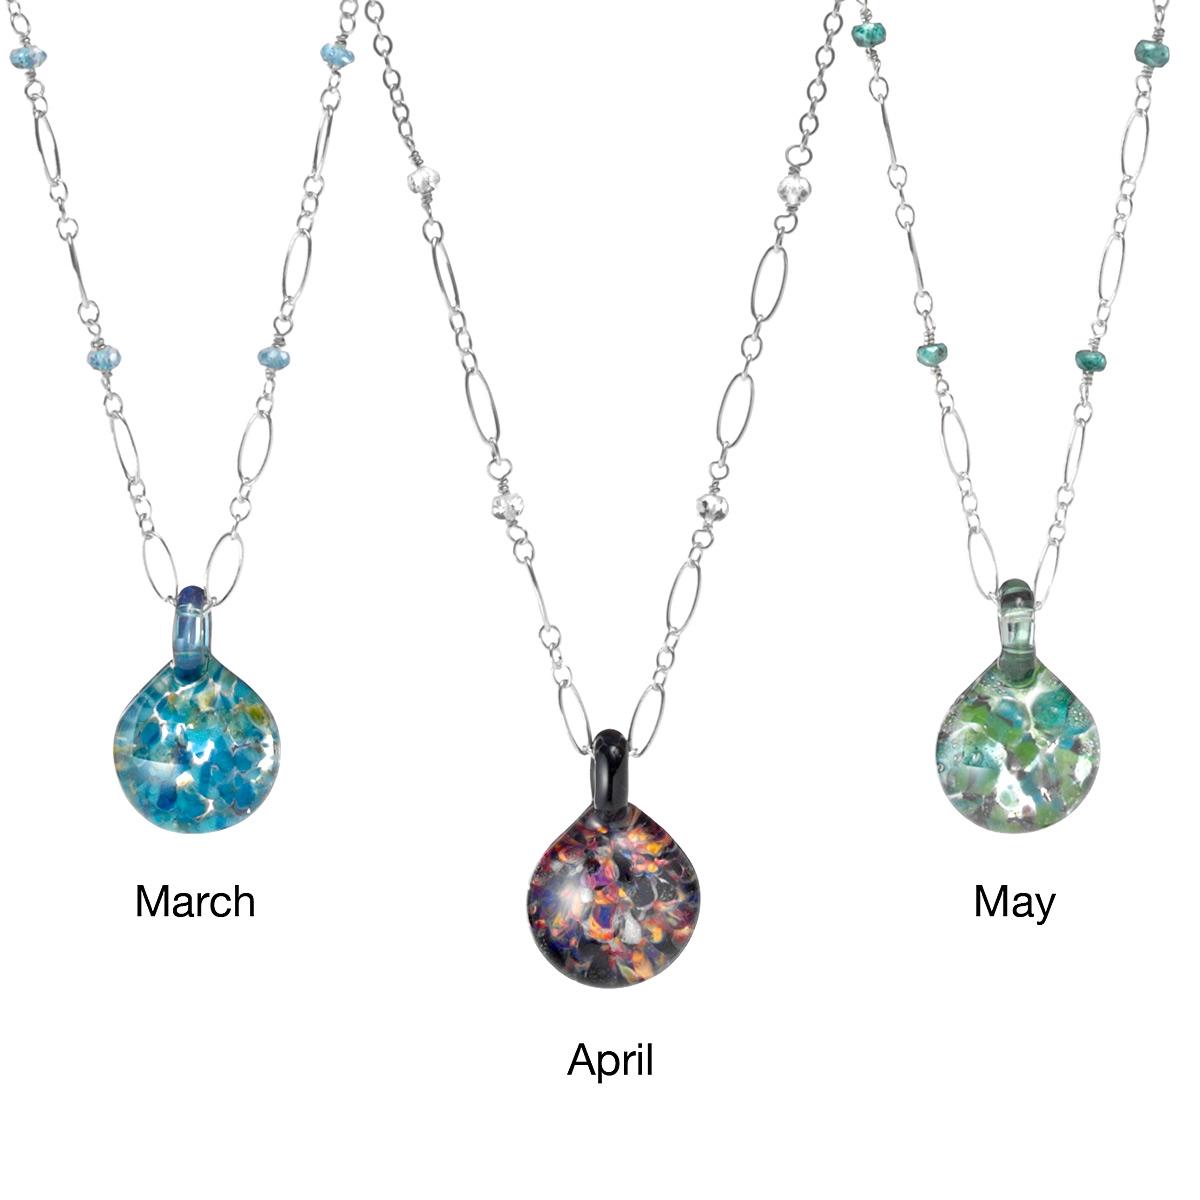 Birthstone necklace birthstones necklaces gems stones jewelry